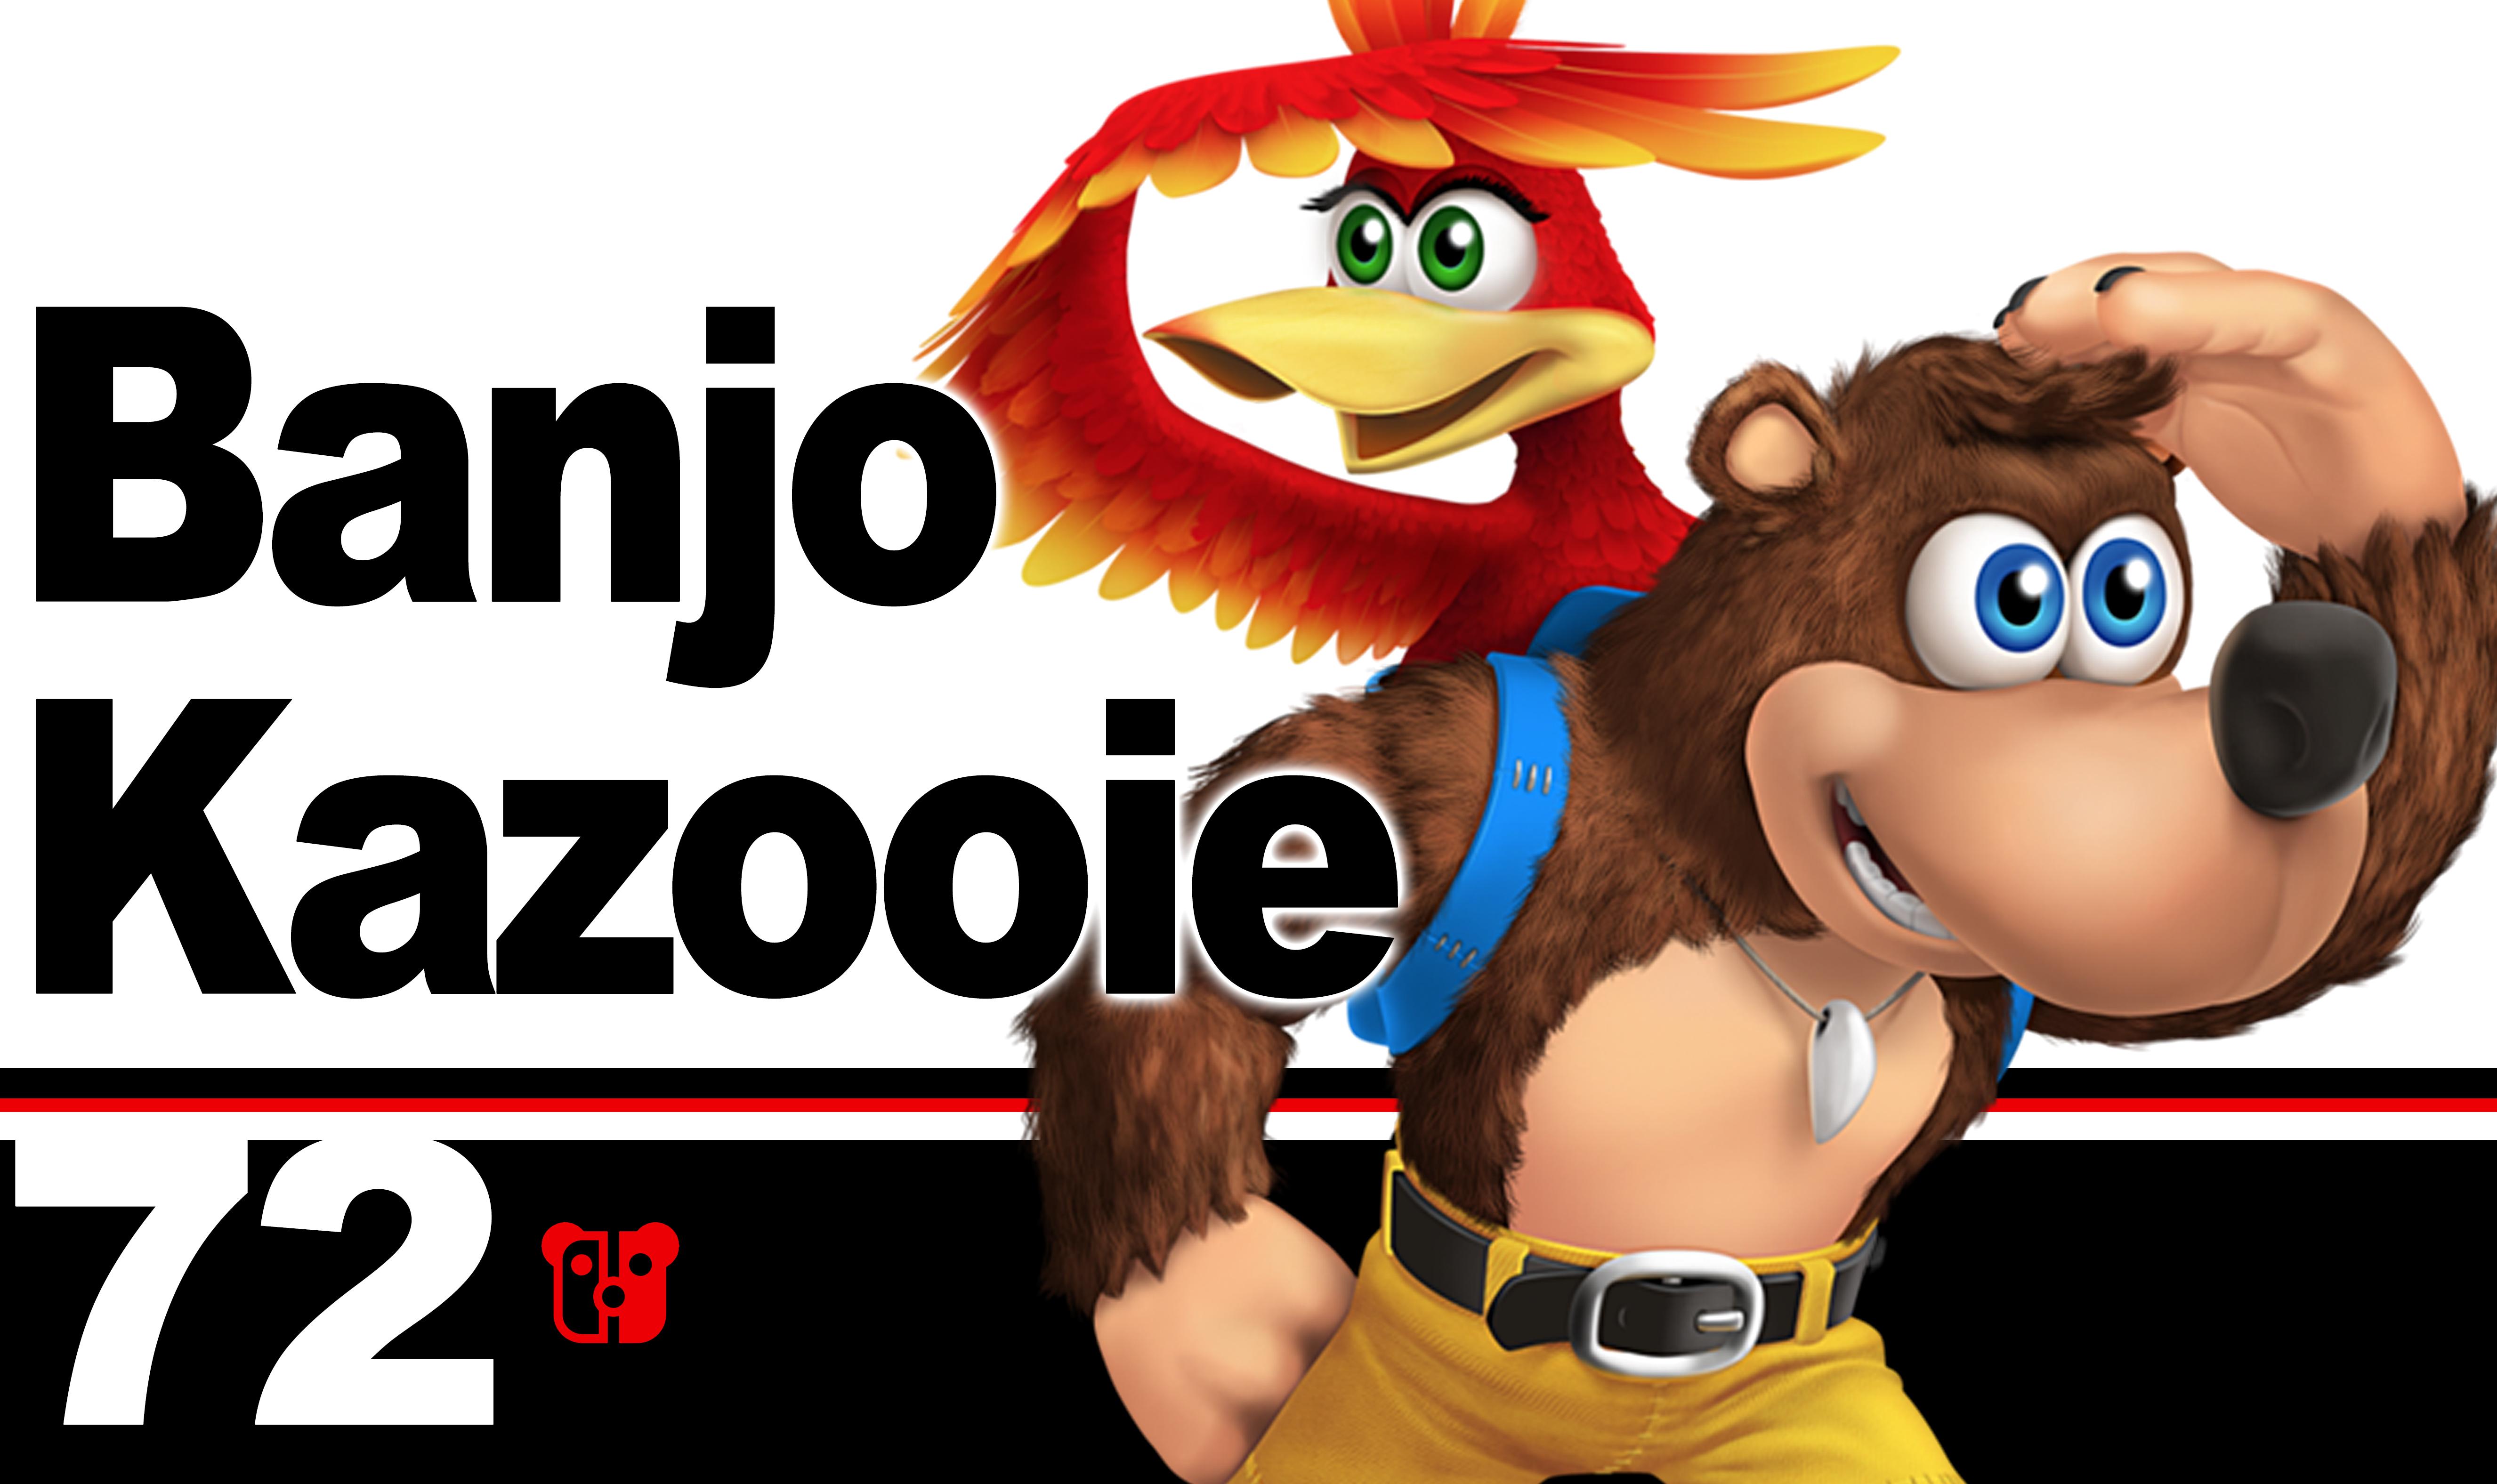 Super Smash Bros. Ultimate Banjo Kazooie